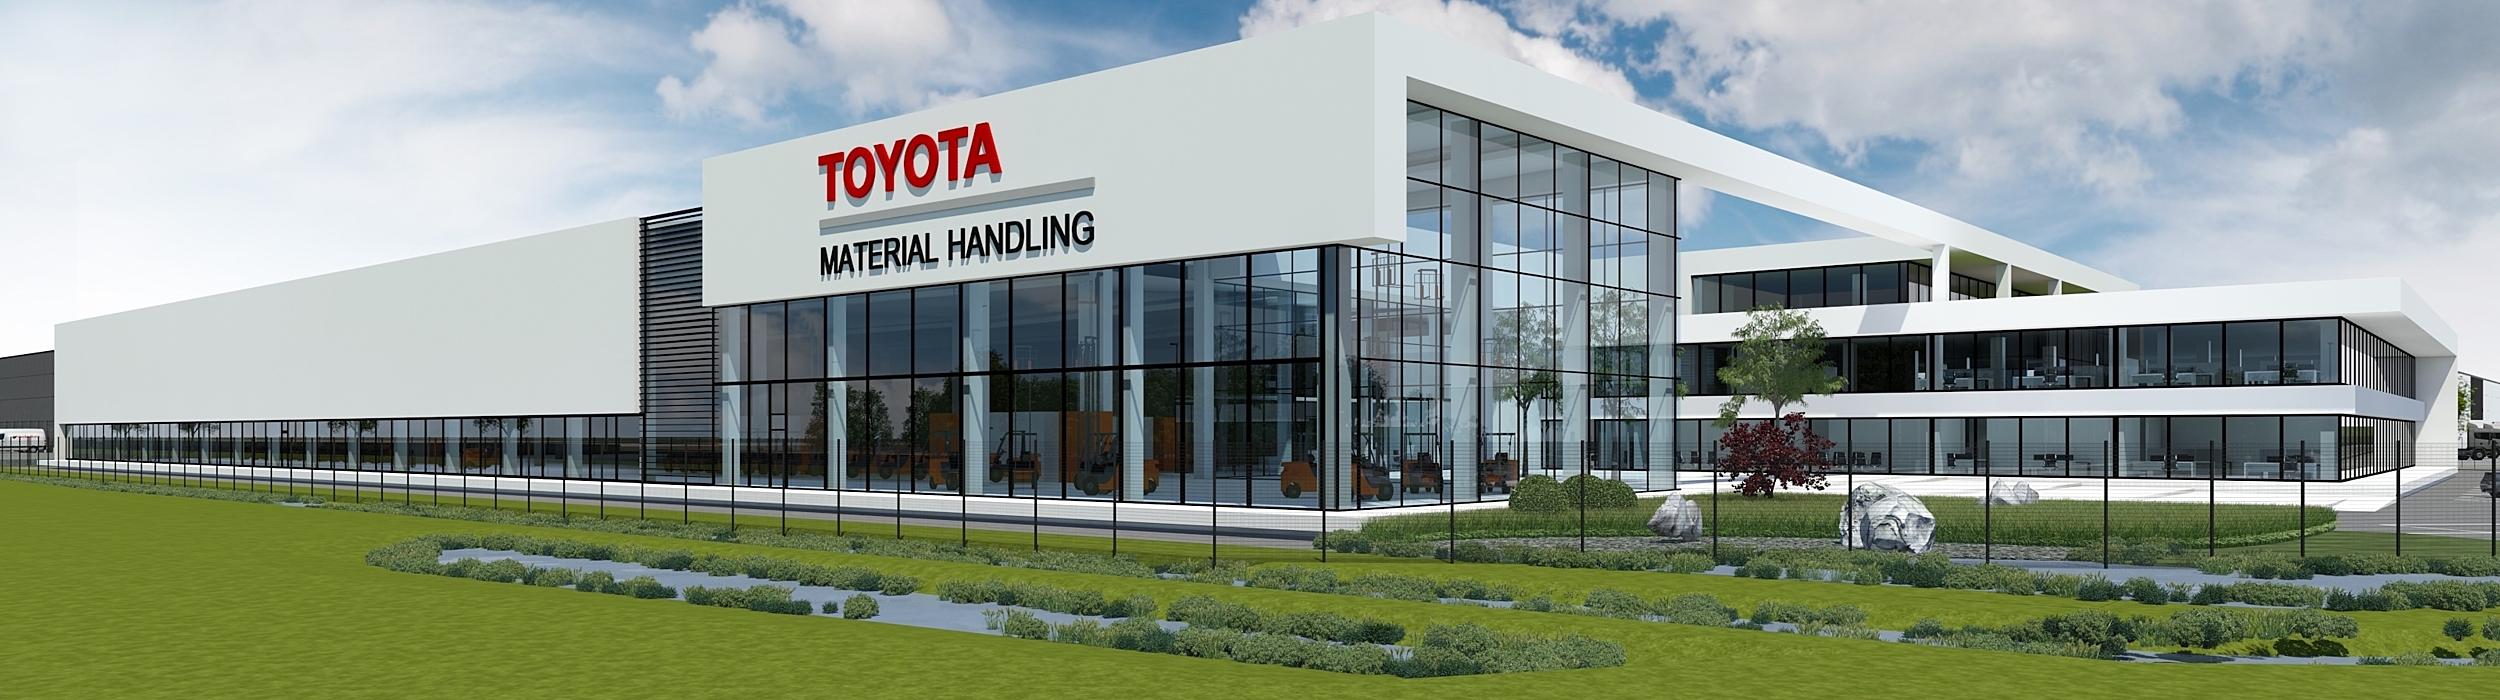 Toyota Material Handling Truck